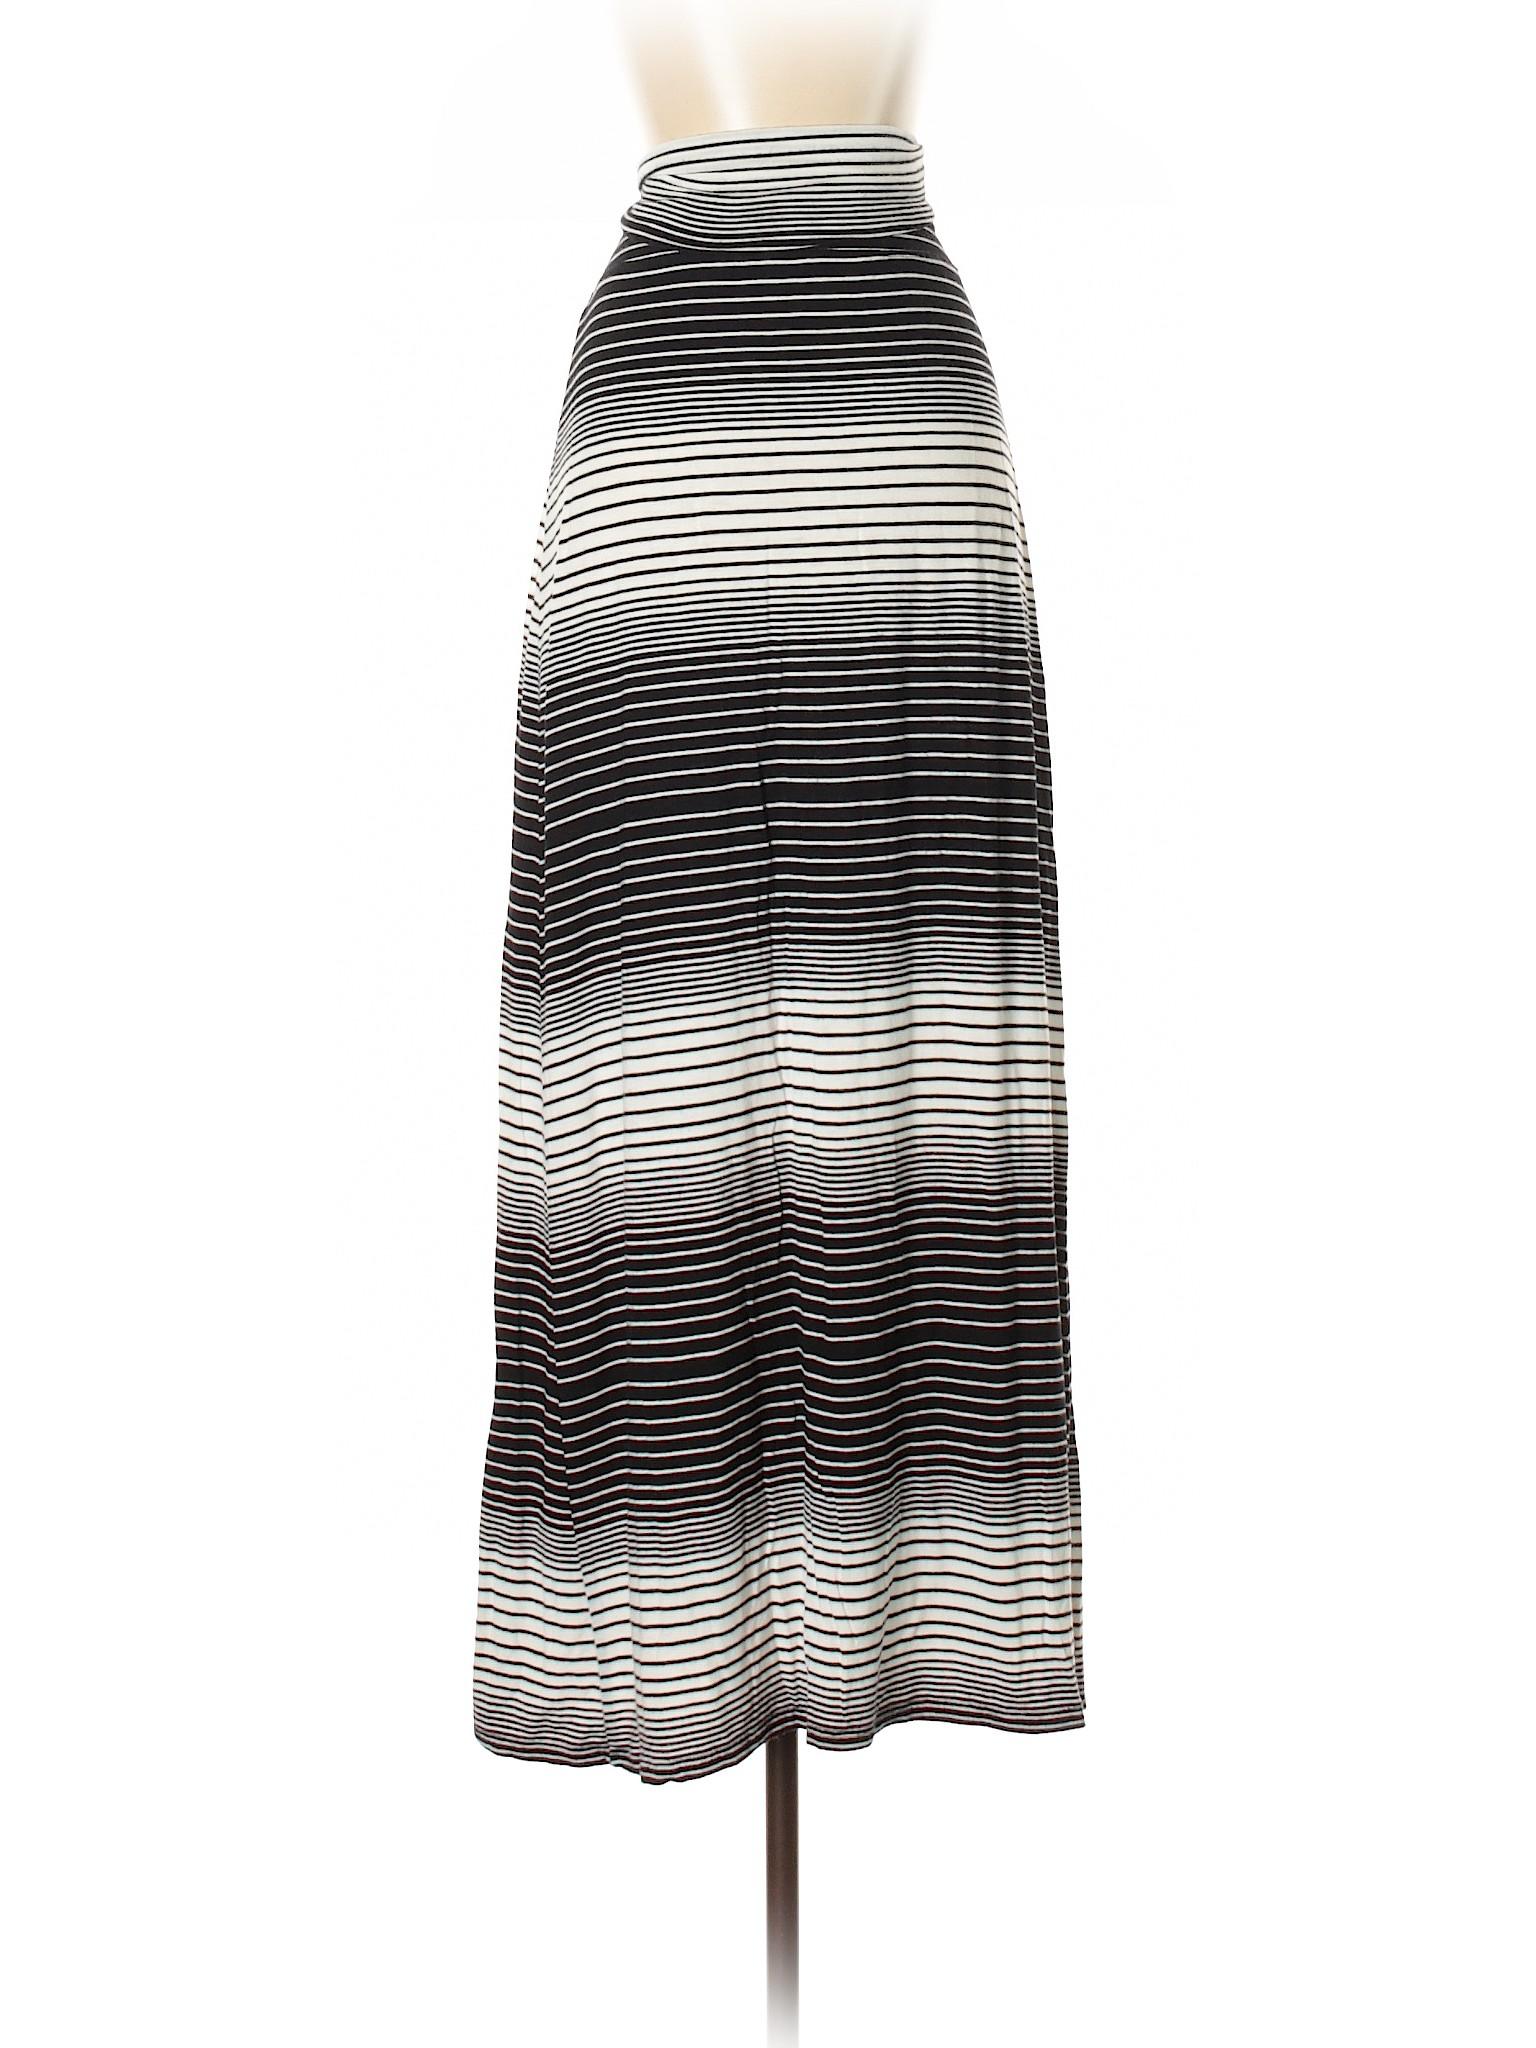 Boutique Boutique Casual Casual Skirt 8U1q08